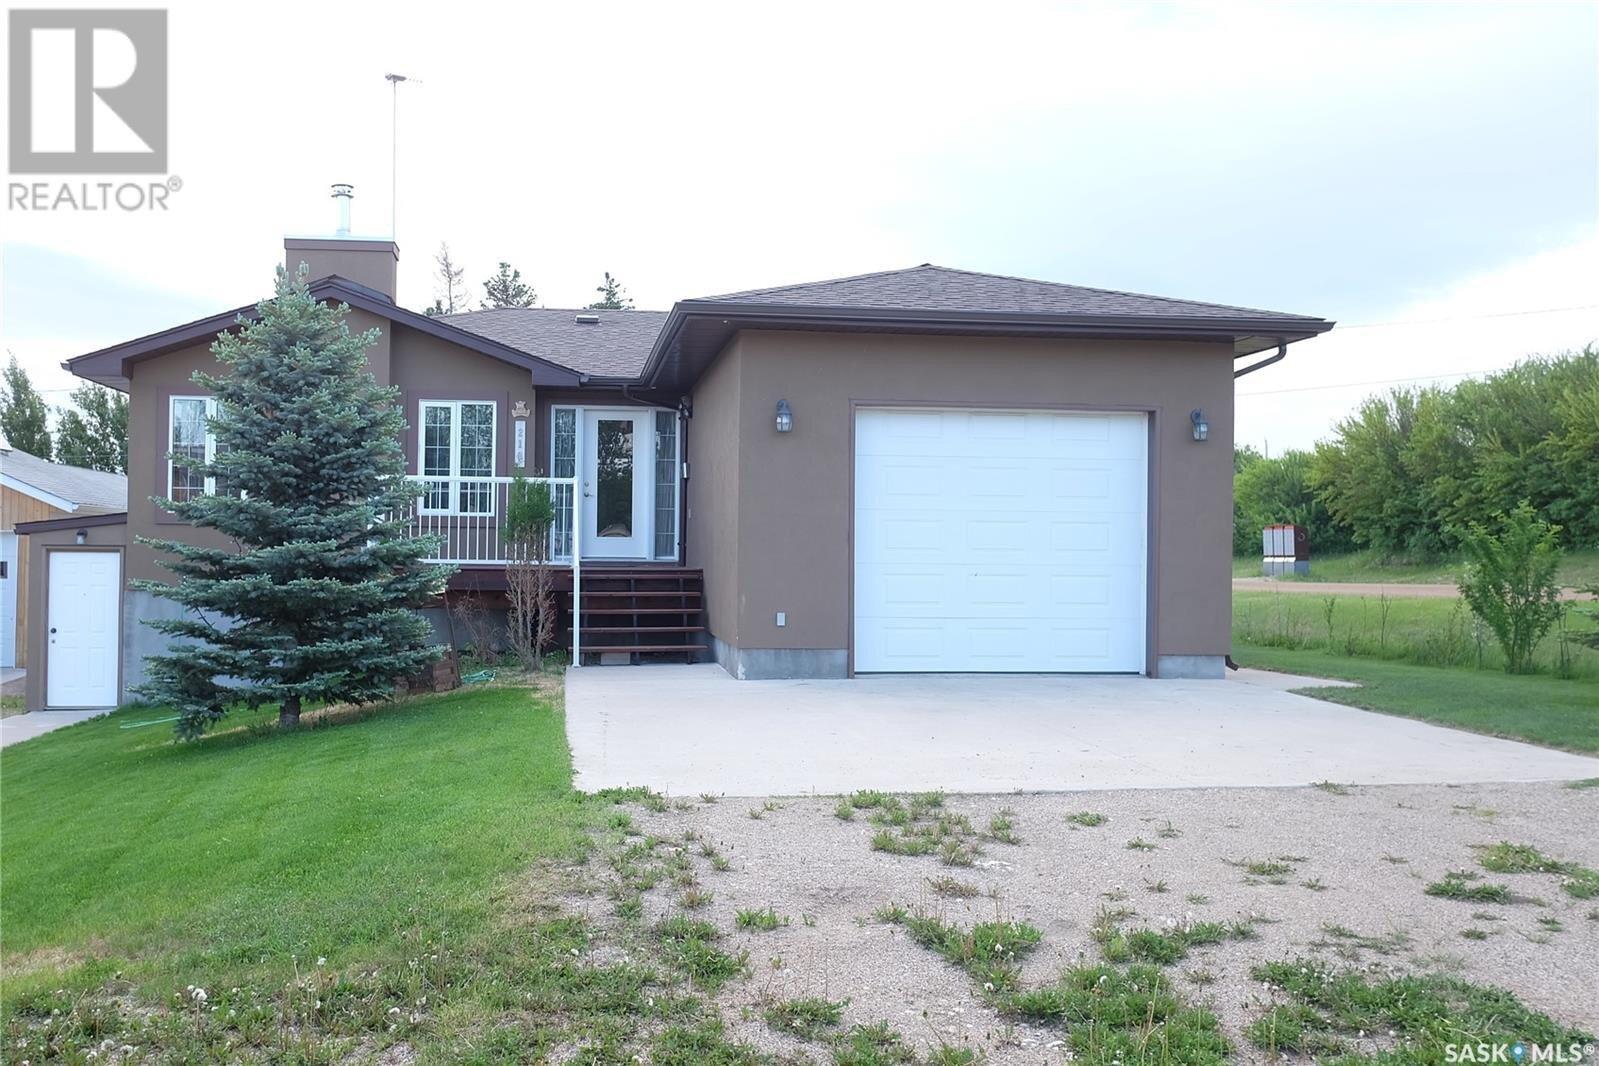 House for sale at 219 Charles St Manitou Beach Saskatchewan - MLS: SK824642